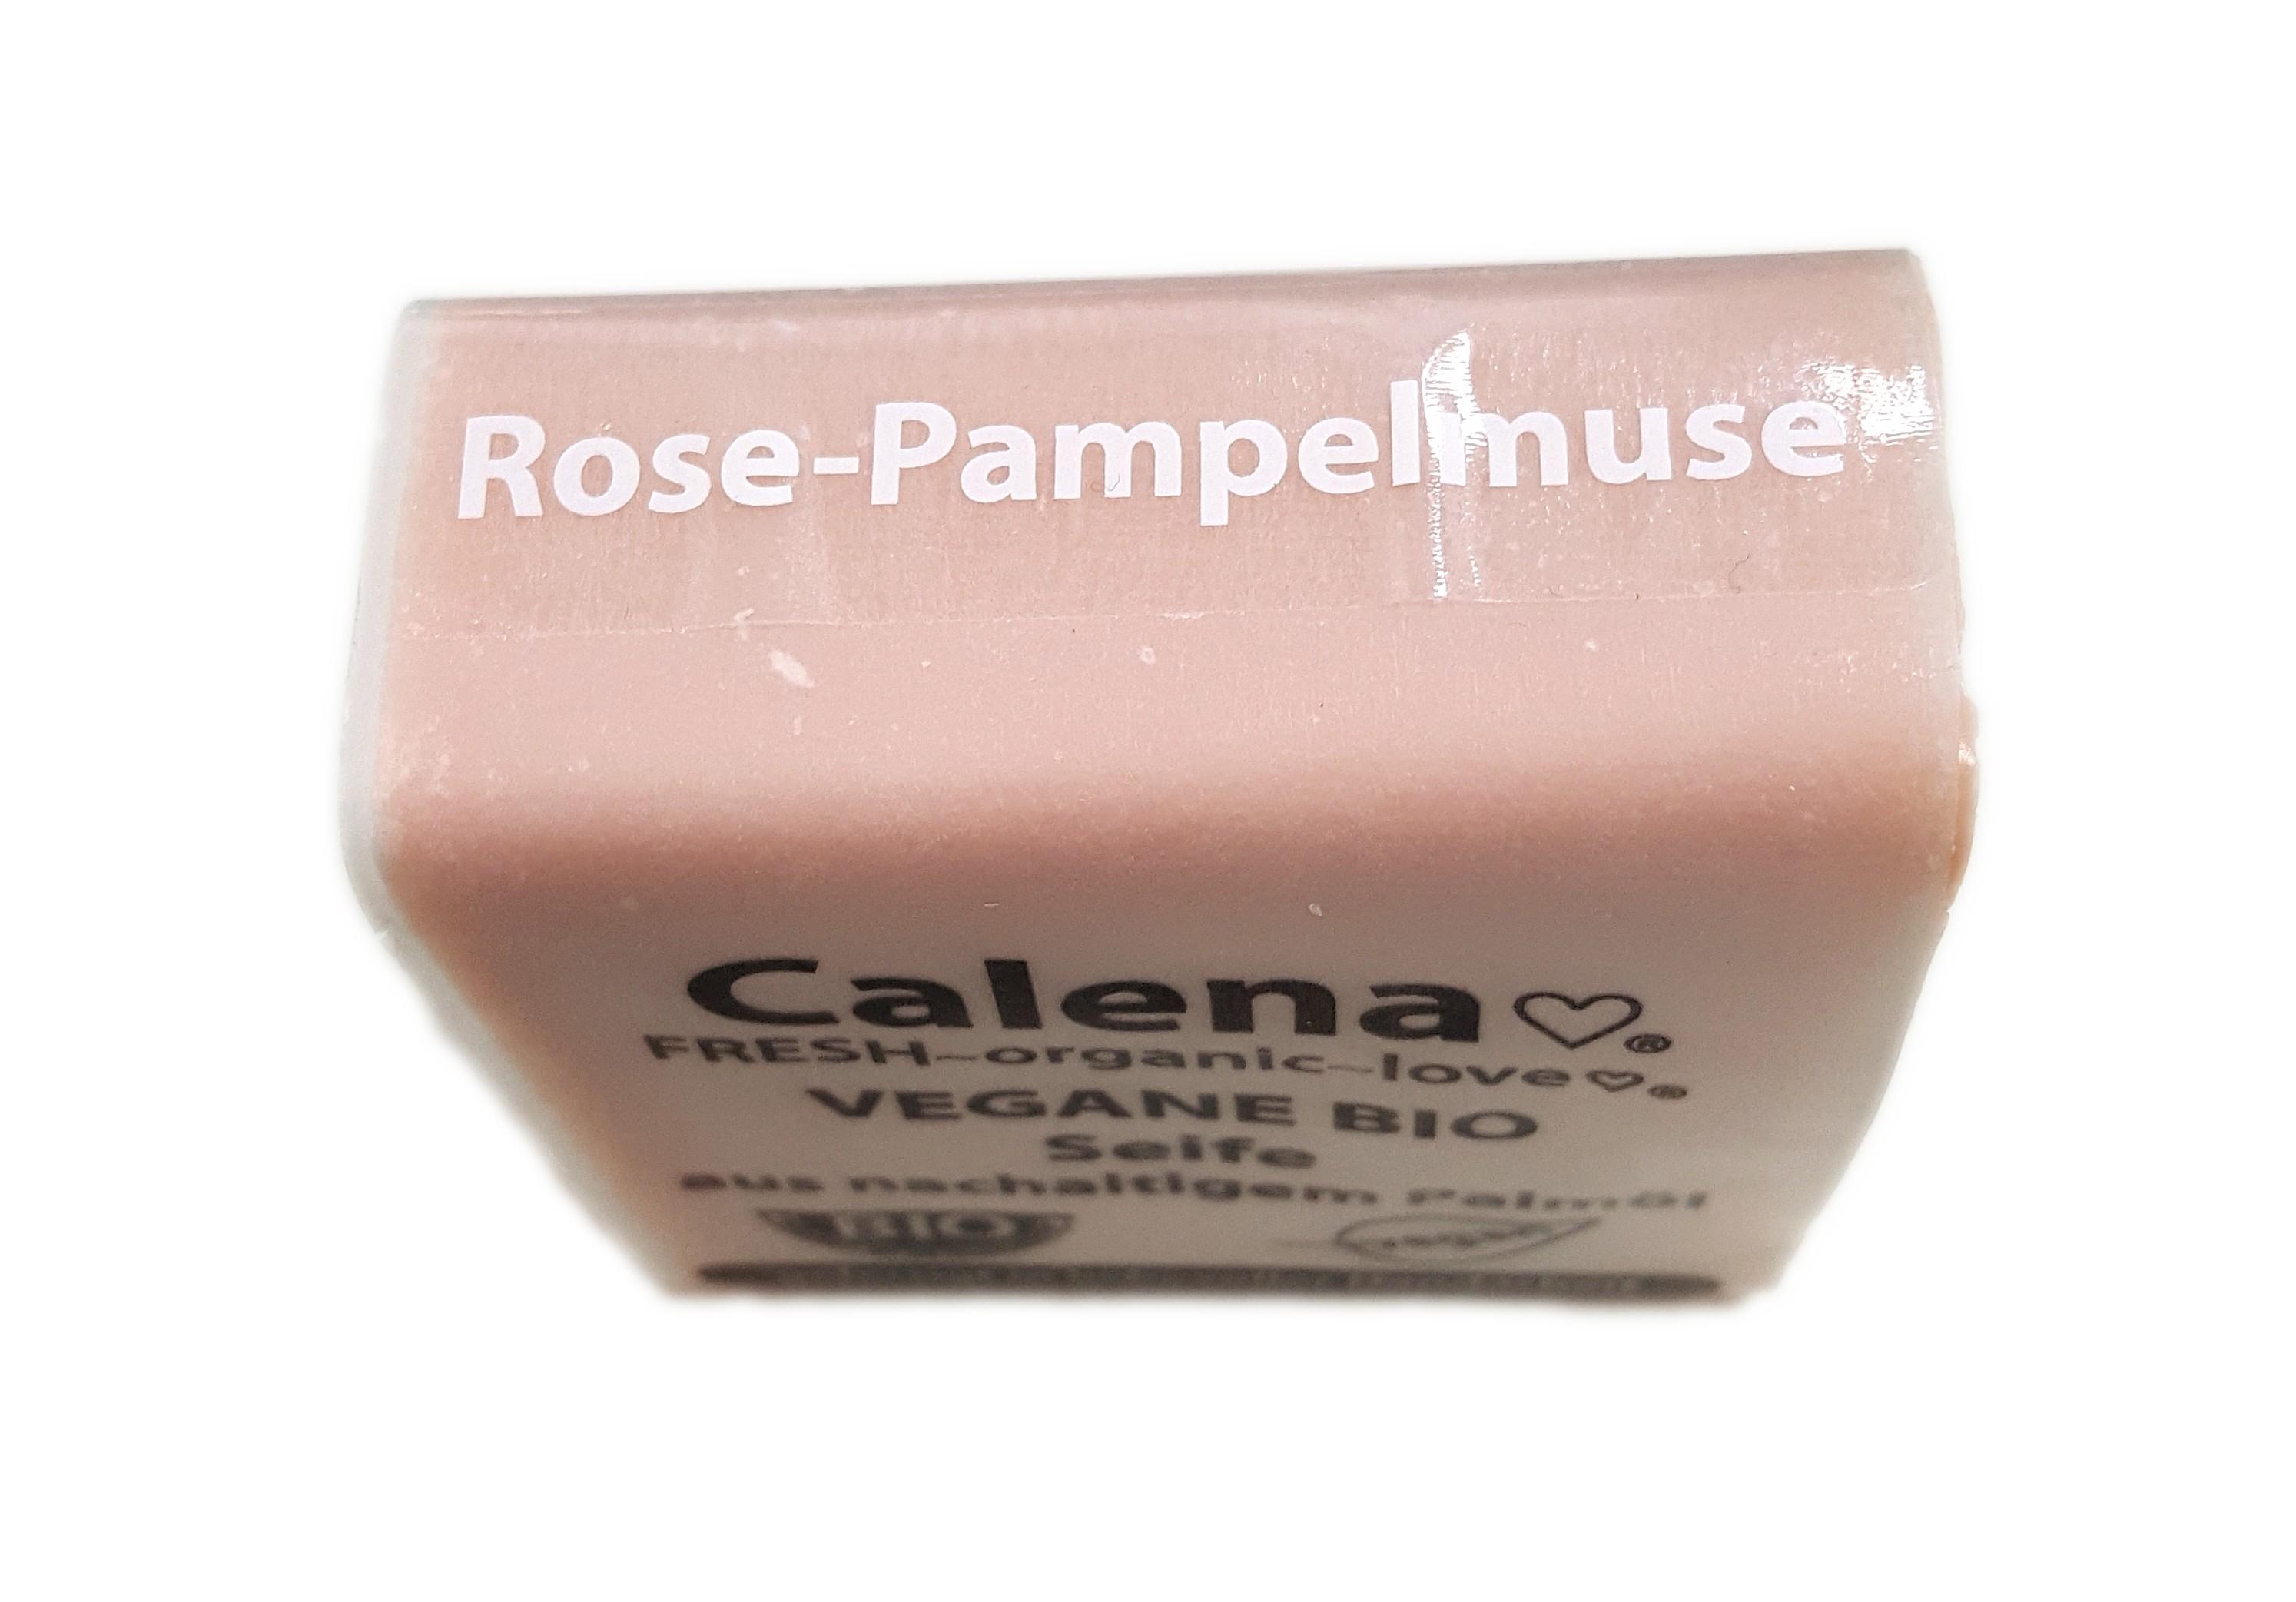 JABON BIO ROSE-PAMPELMUSE (POMELO)